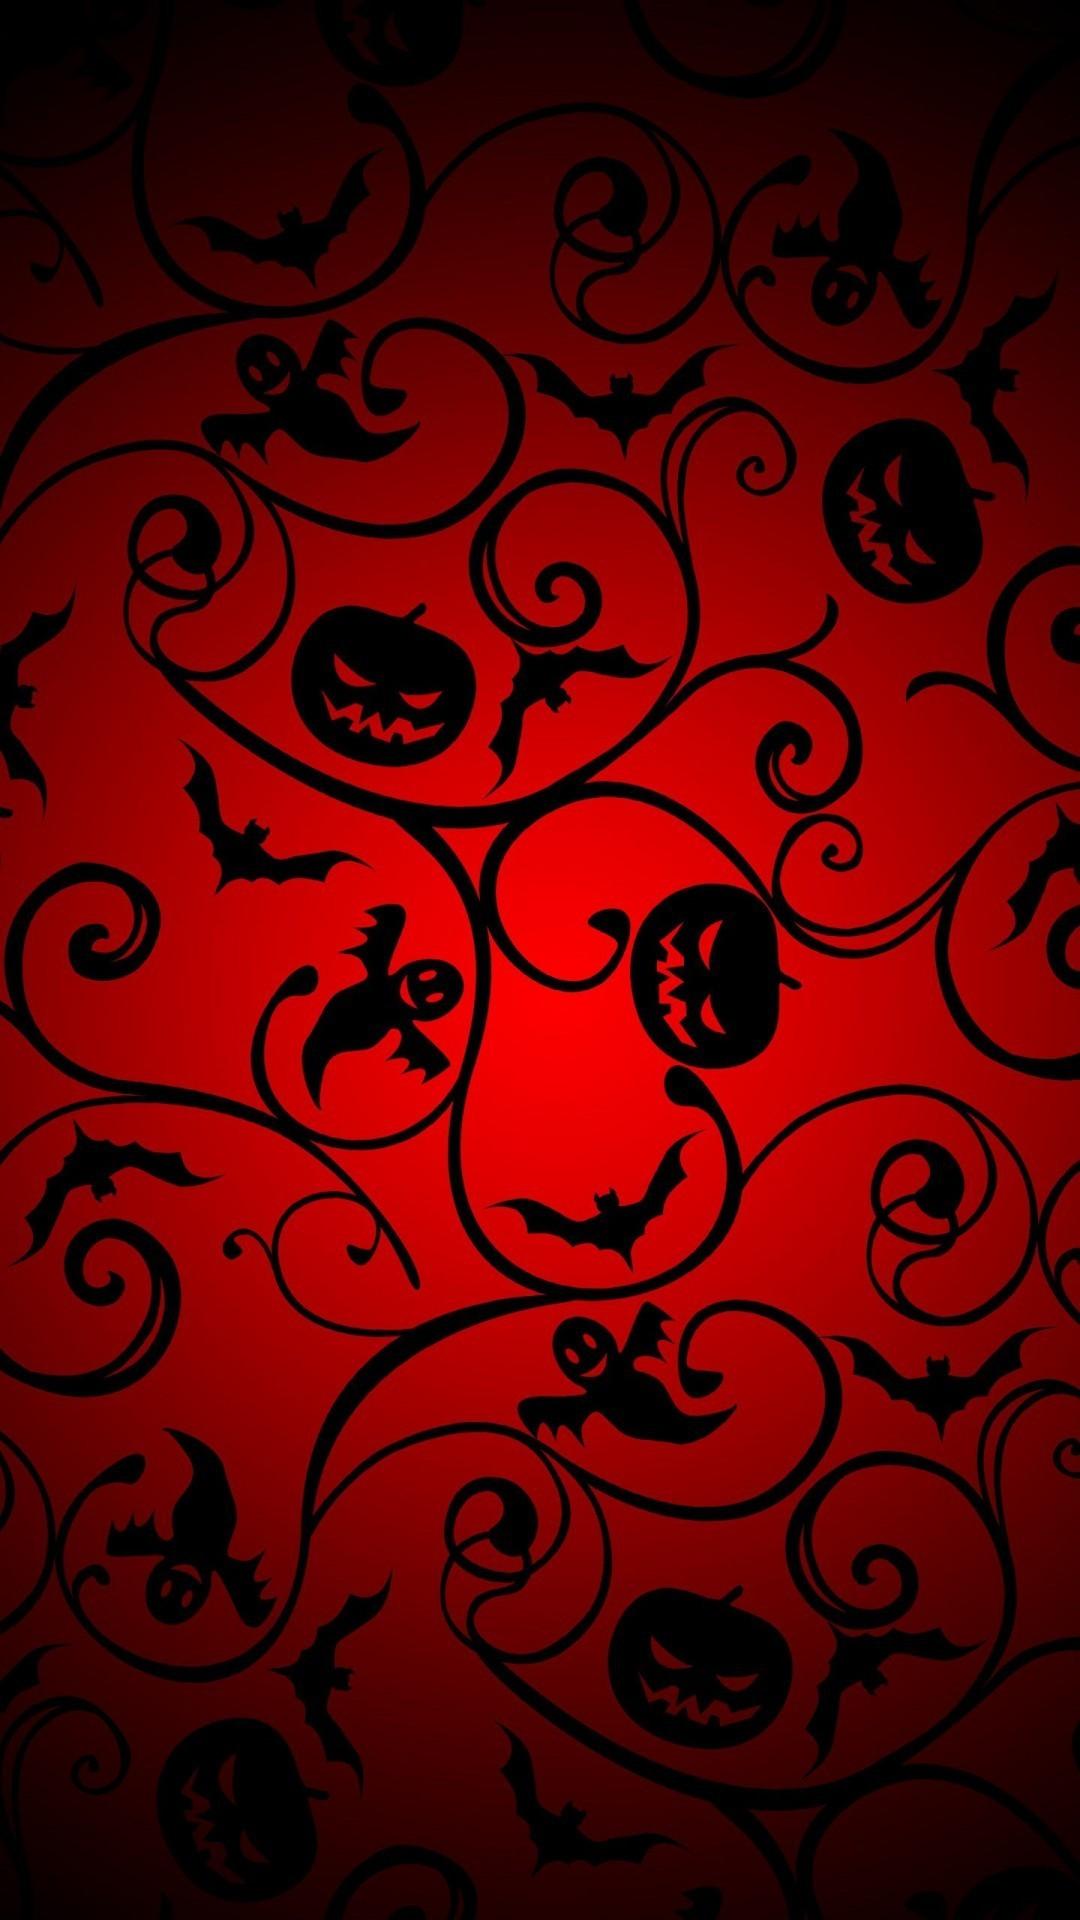 Res: 1080x1920, Halloween Pumpkin